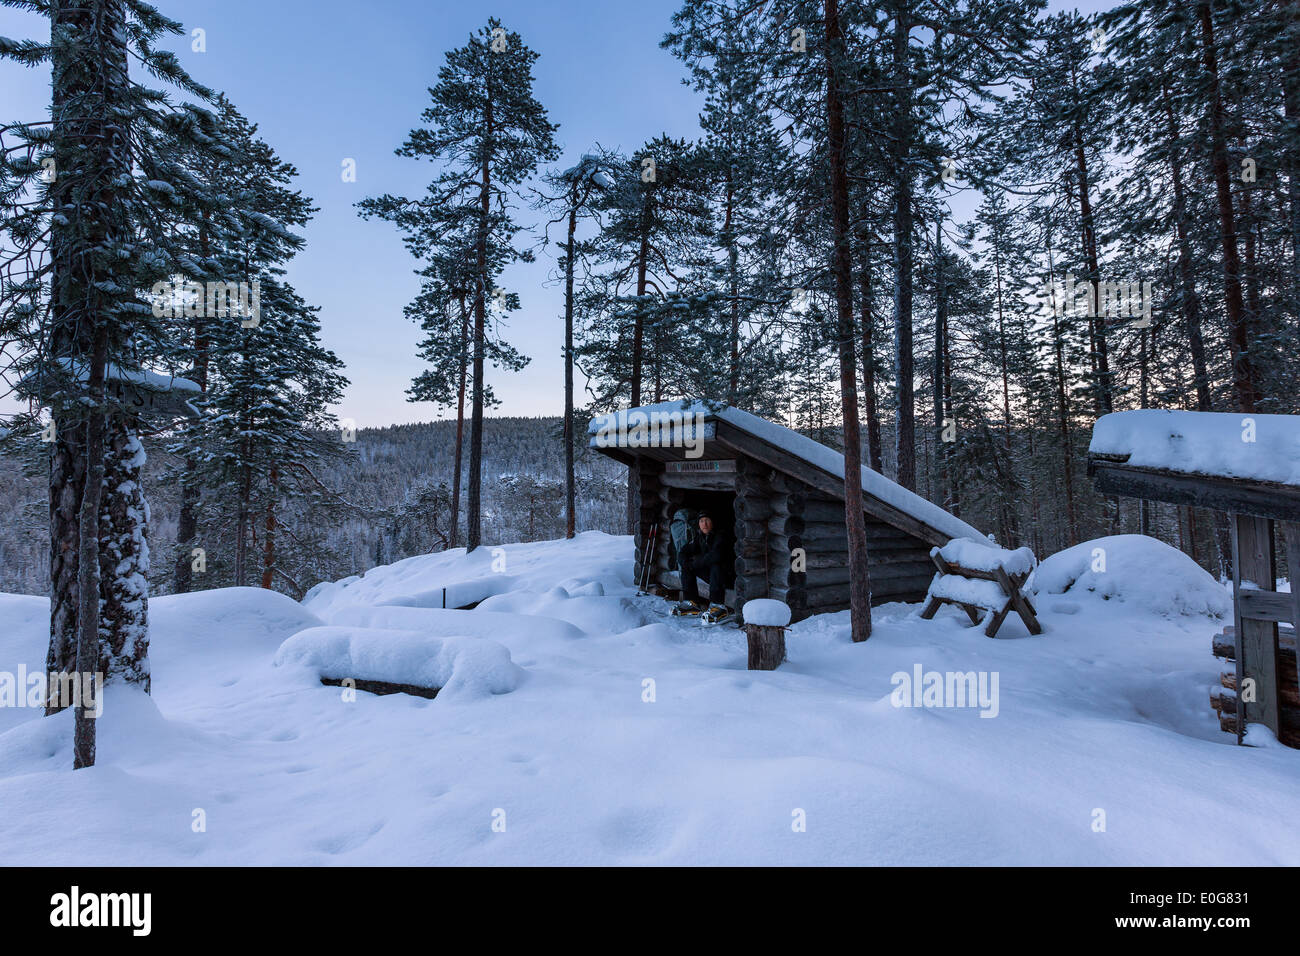 Julmakallio appentis à Korouoma, GR20, la Finlande, l'UE Photo Stock